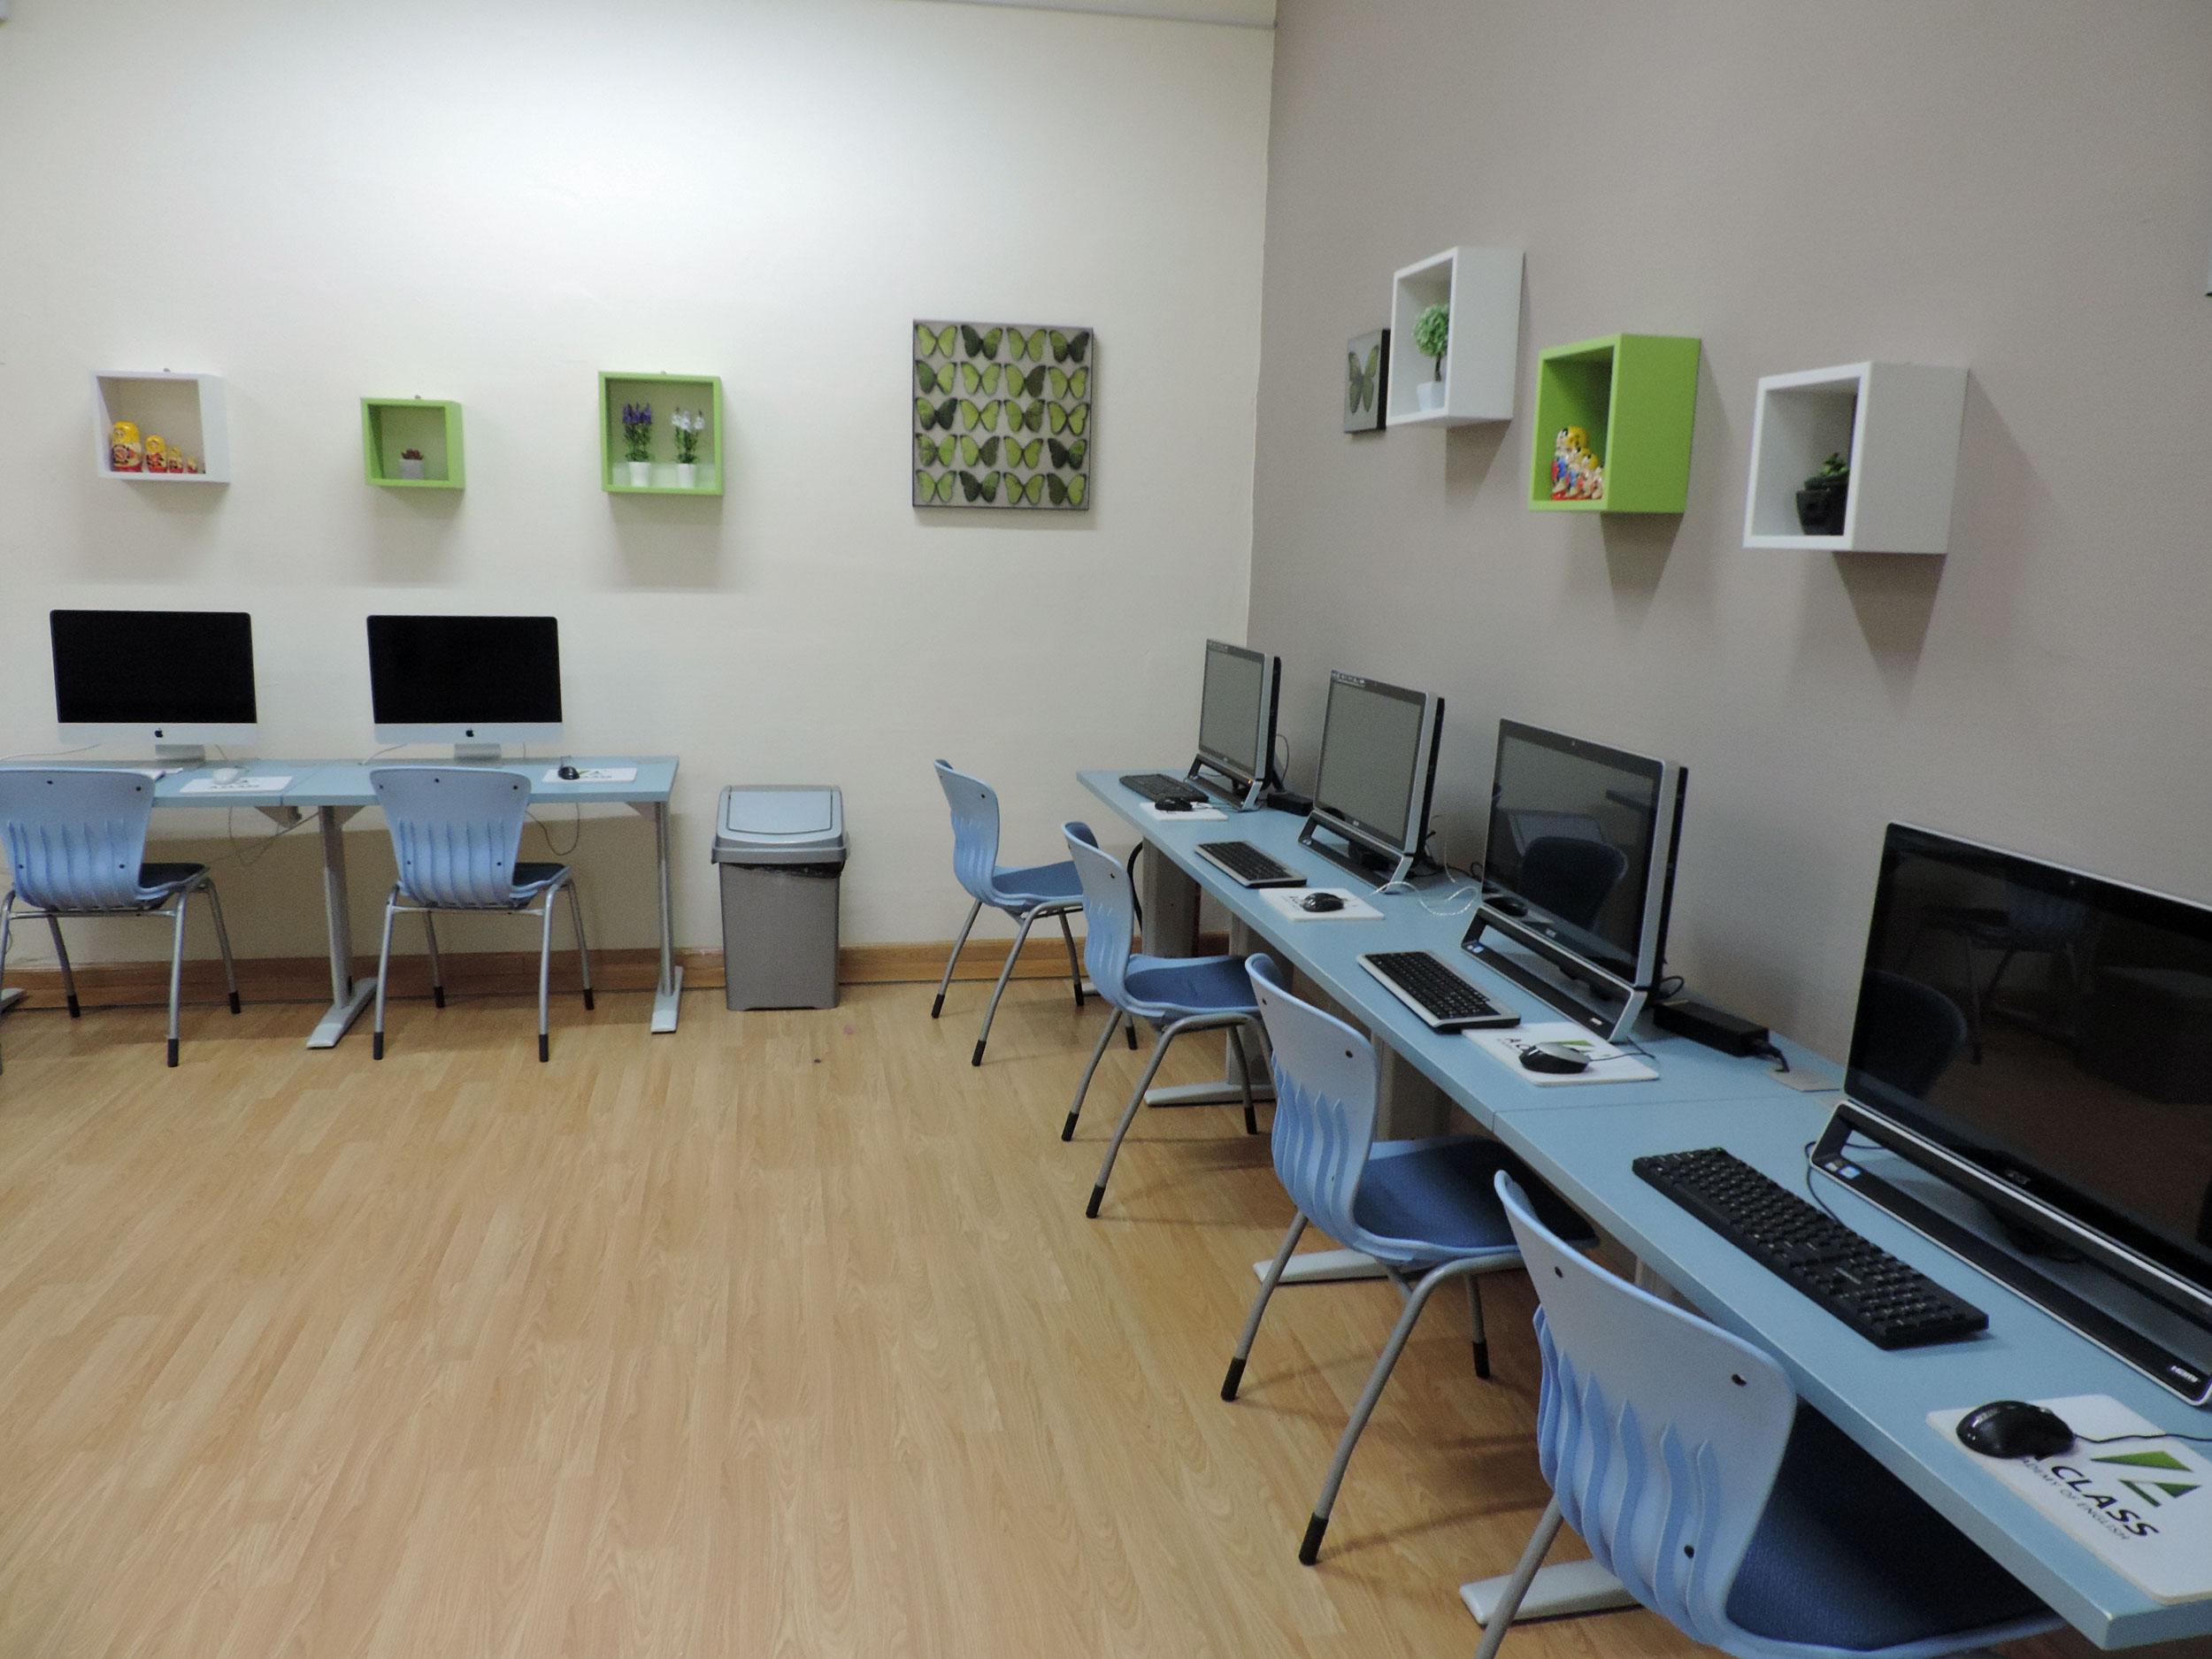 AClass, computer's room